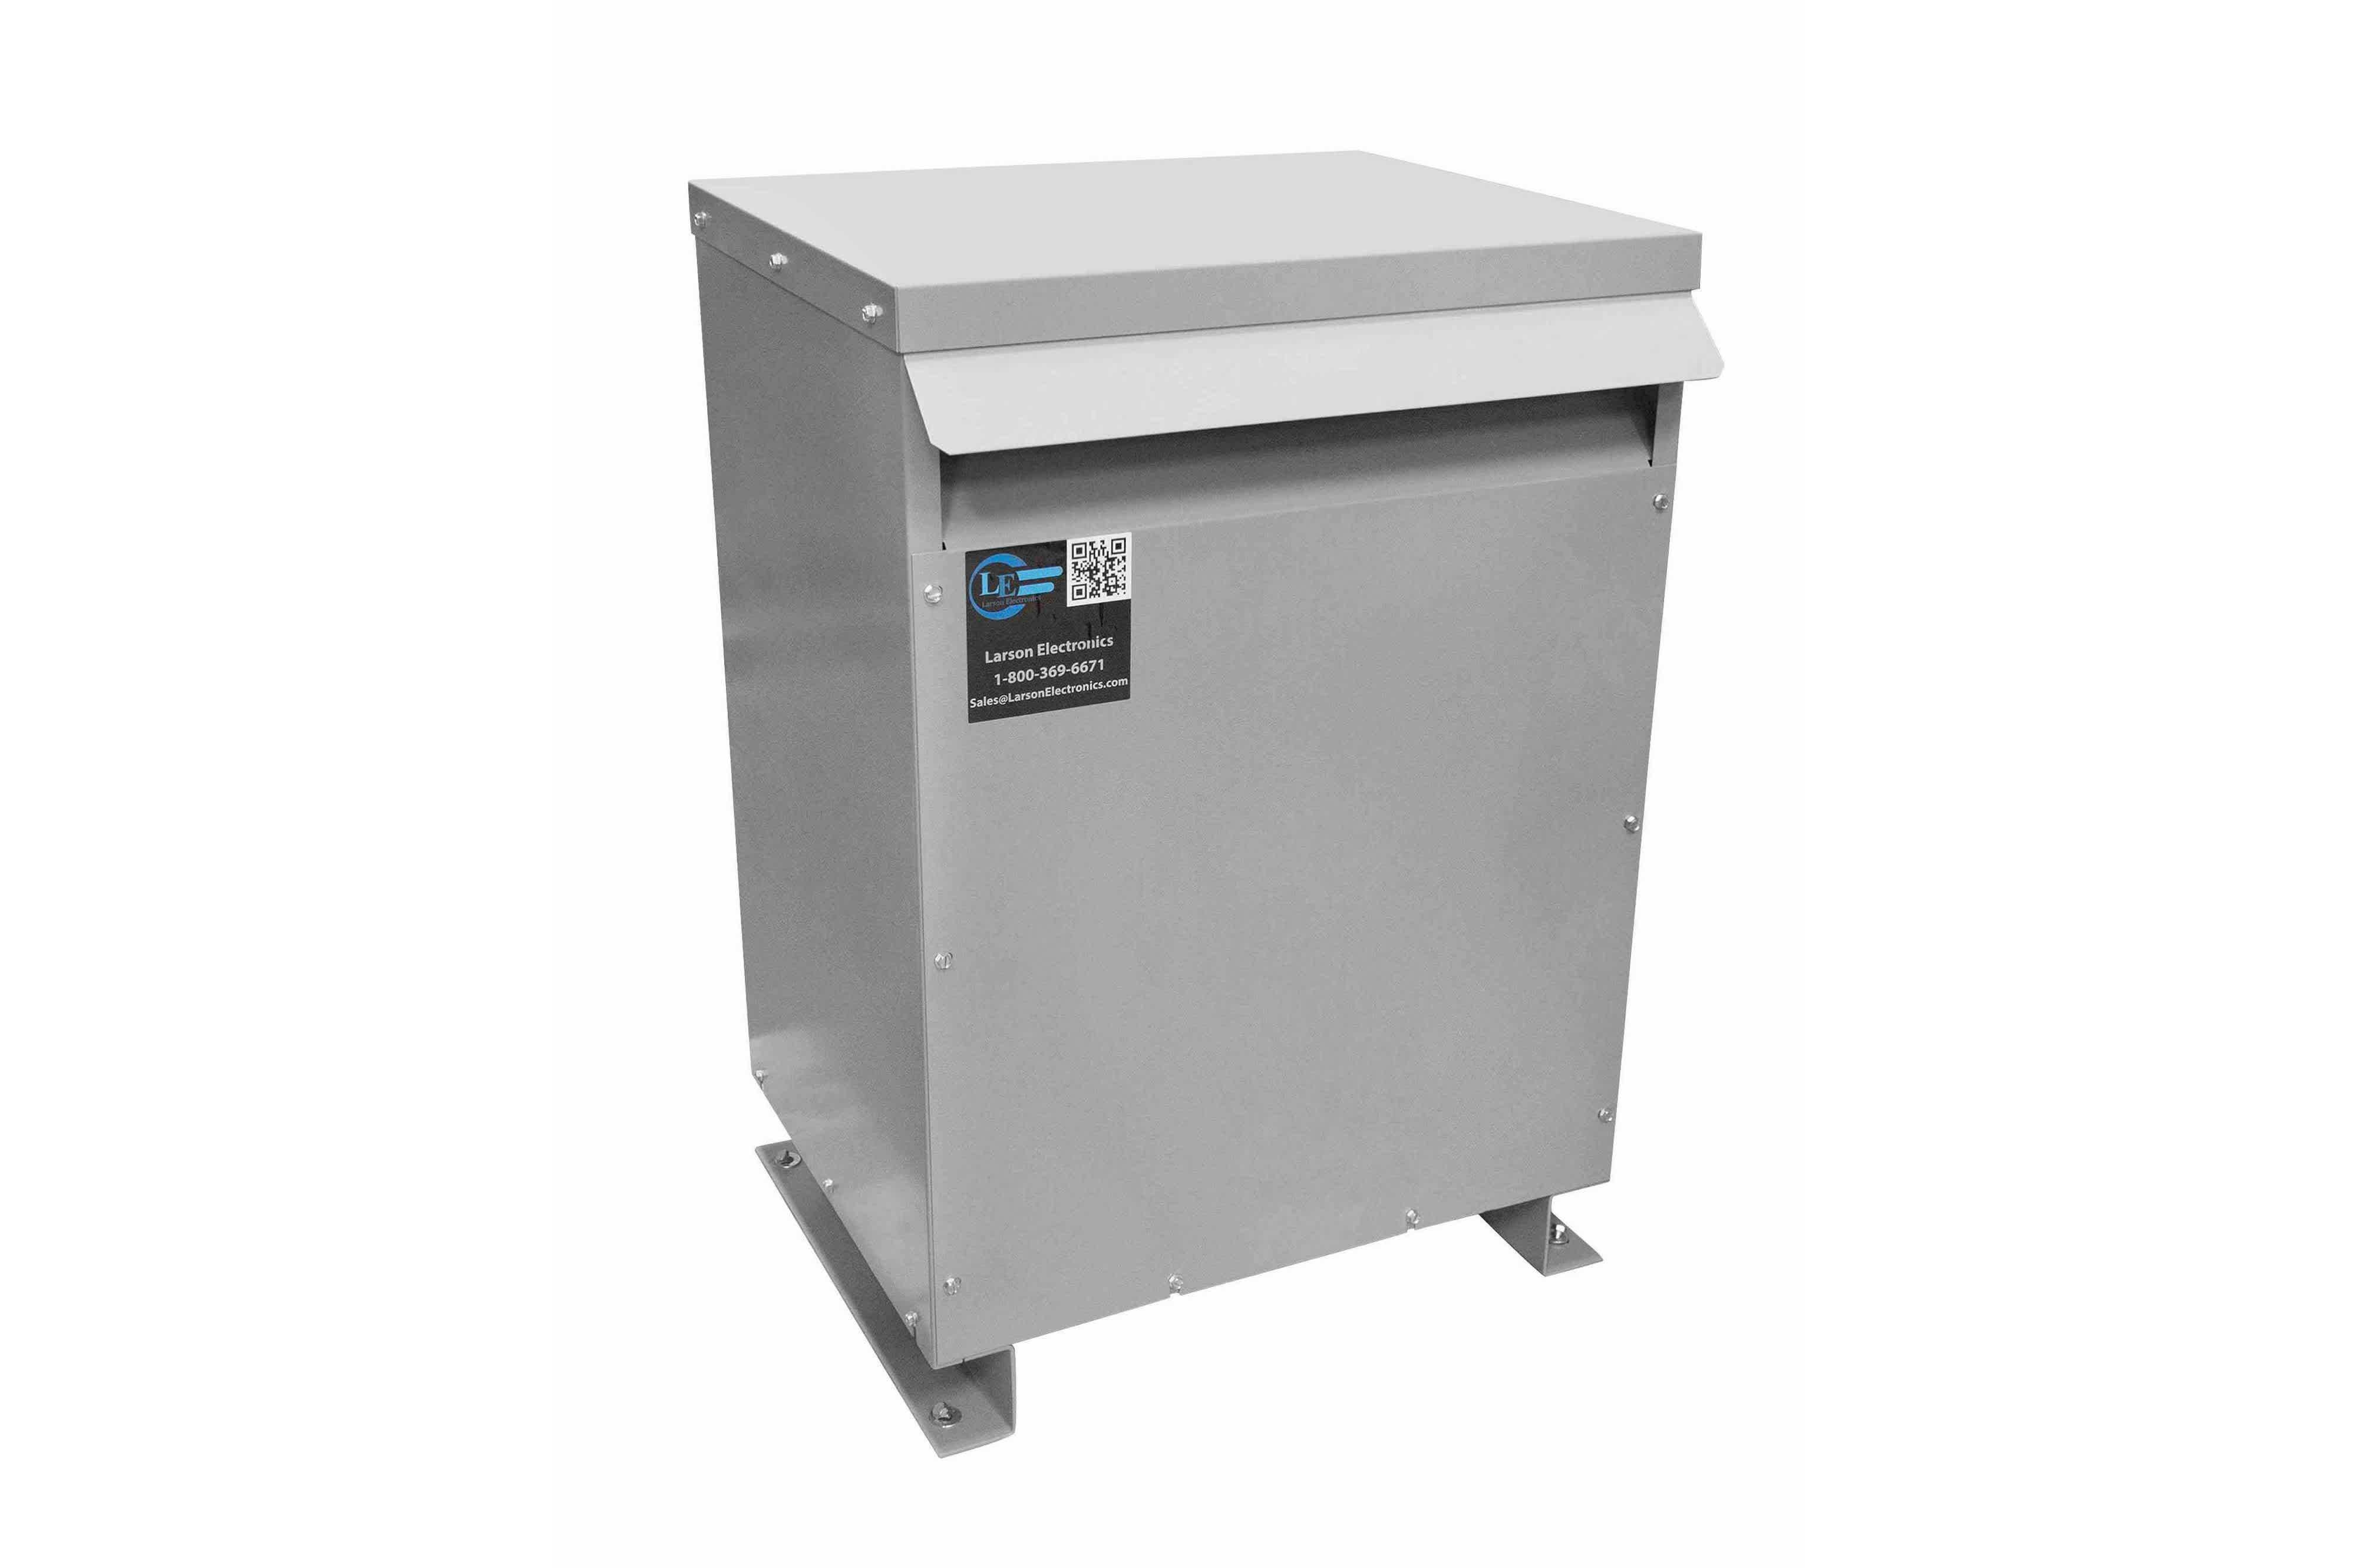 32.5 kVA 3PH Isolation Transformer, 480V Wye Primary, 480Y/277 Wye-N Secondary, N3R, Ventilated, 60 Hz